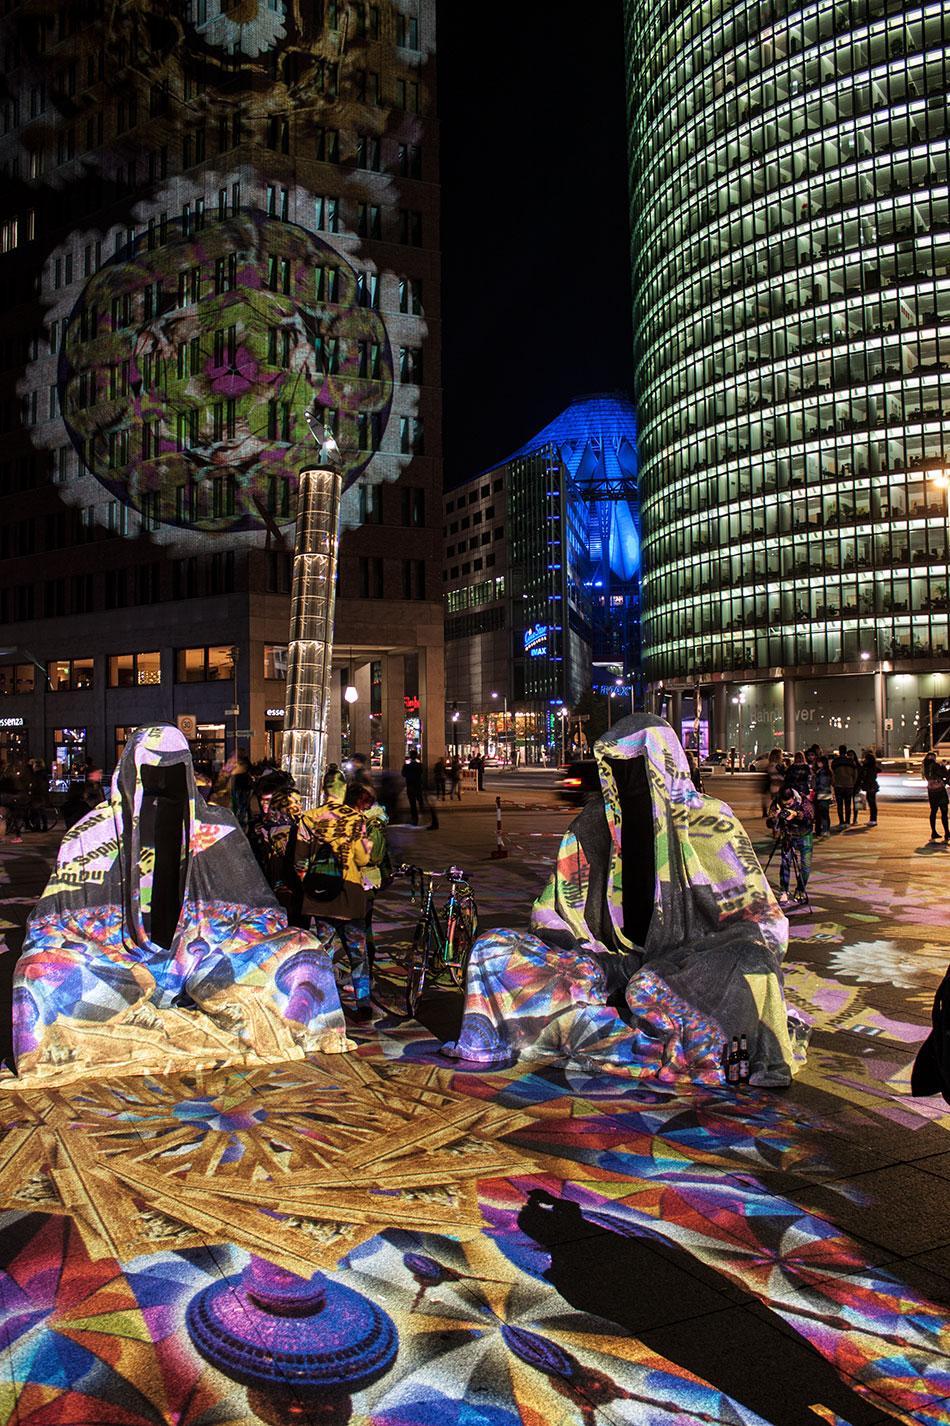 festival-of-lights-berlin-potzdamer-platz-light-art-show-exhibition-lumina-guardians-of-time-manfred-kili-kielnhofer-contemporary-arts-design-large-scale-monumental-public-sculpture-3654